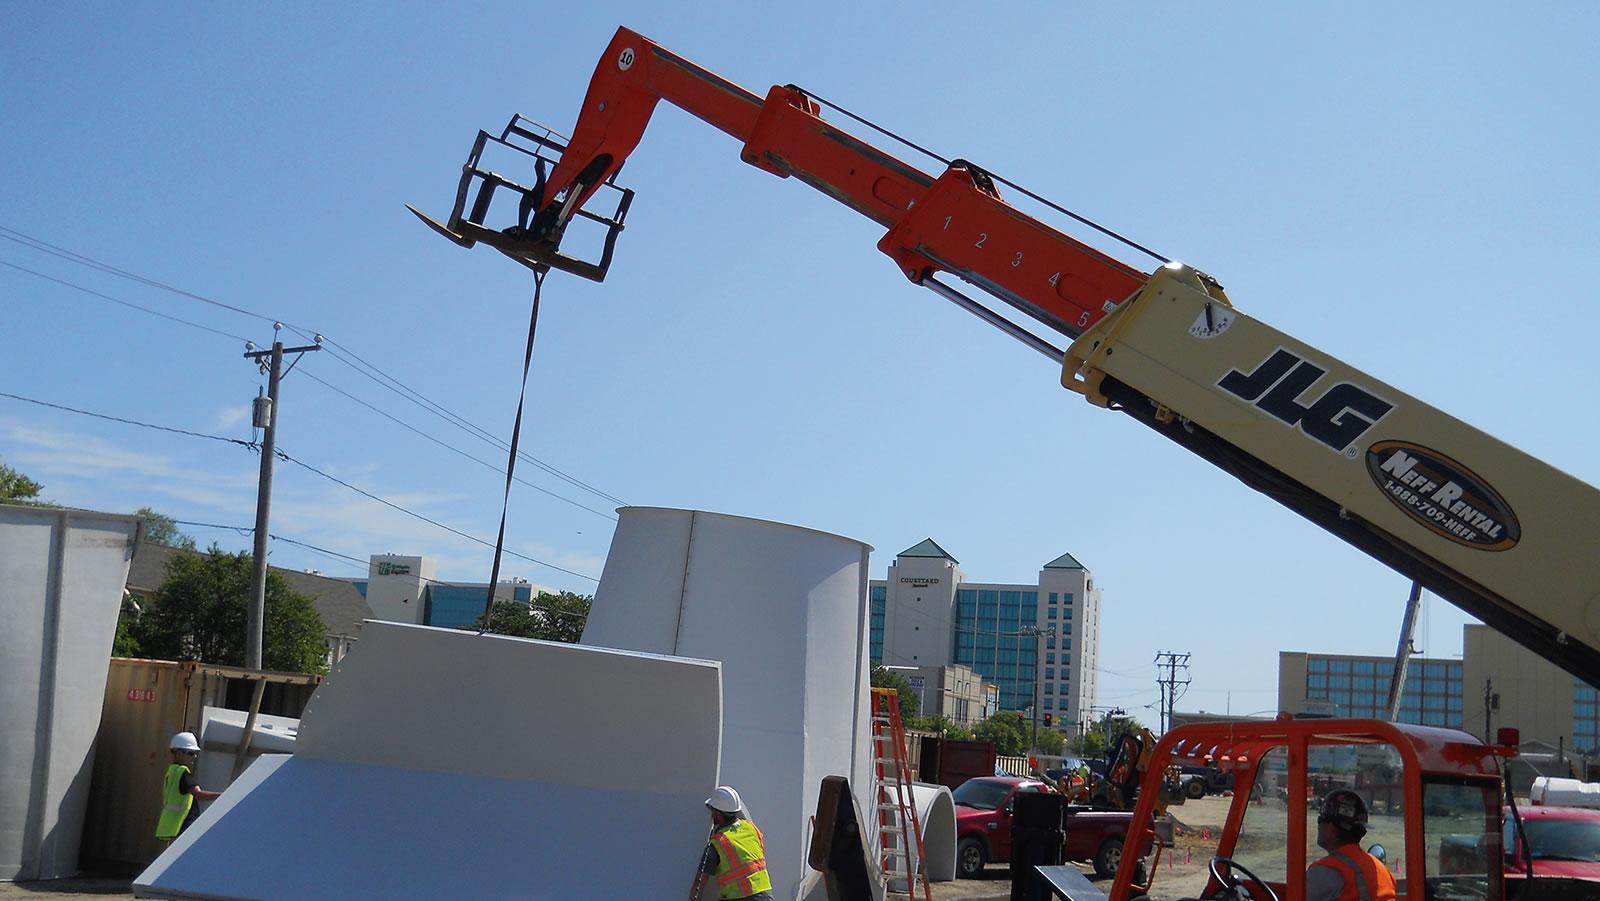 Crane Service - Machinery Movers and Erectors